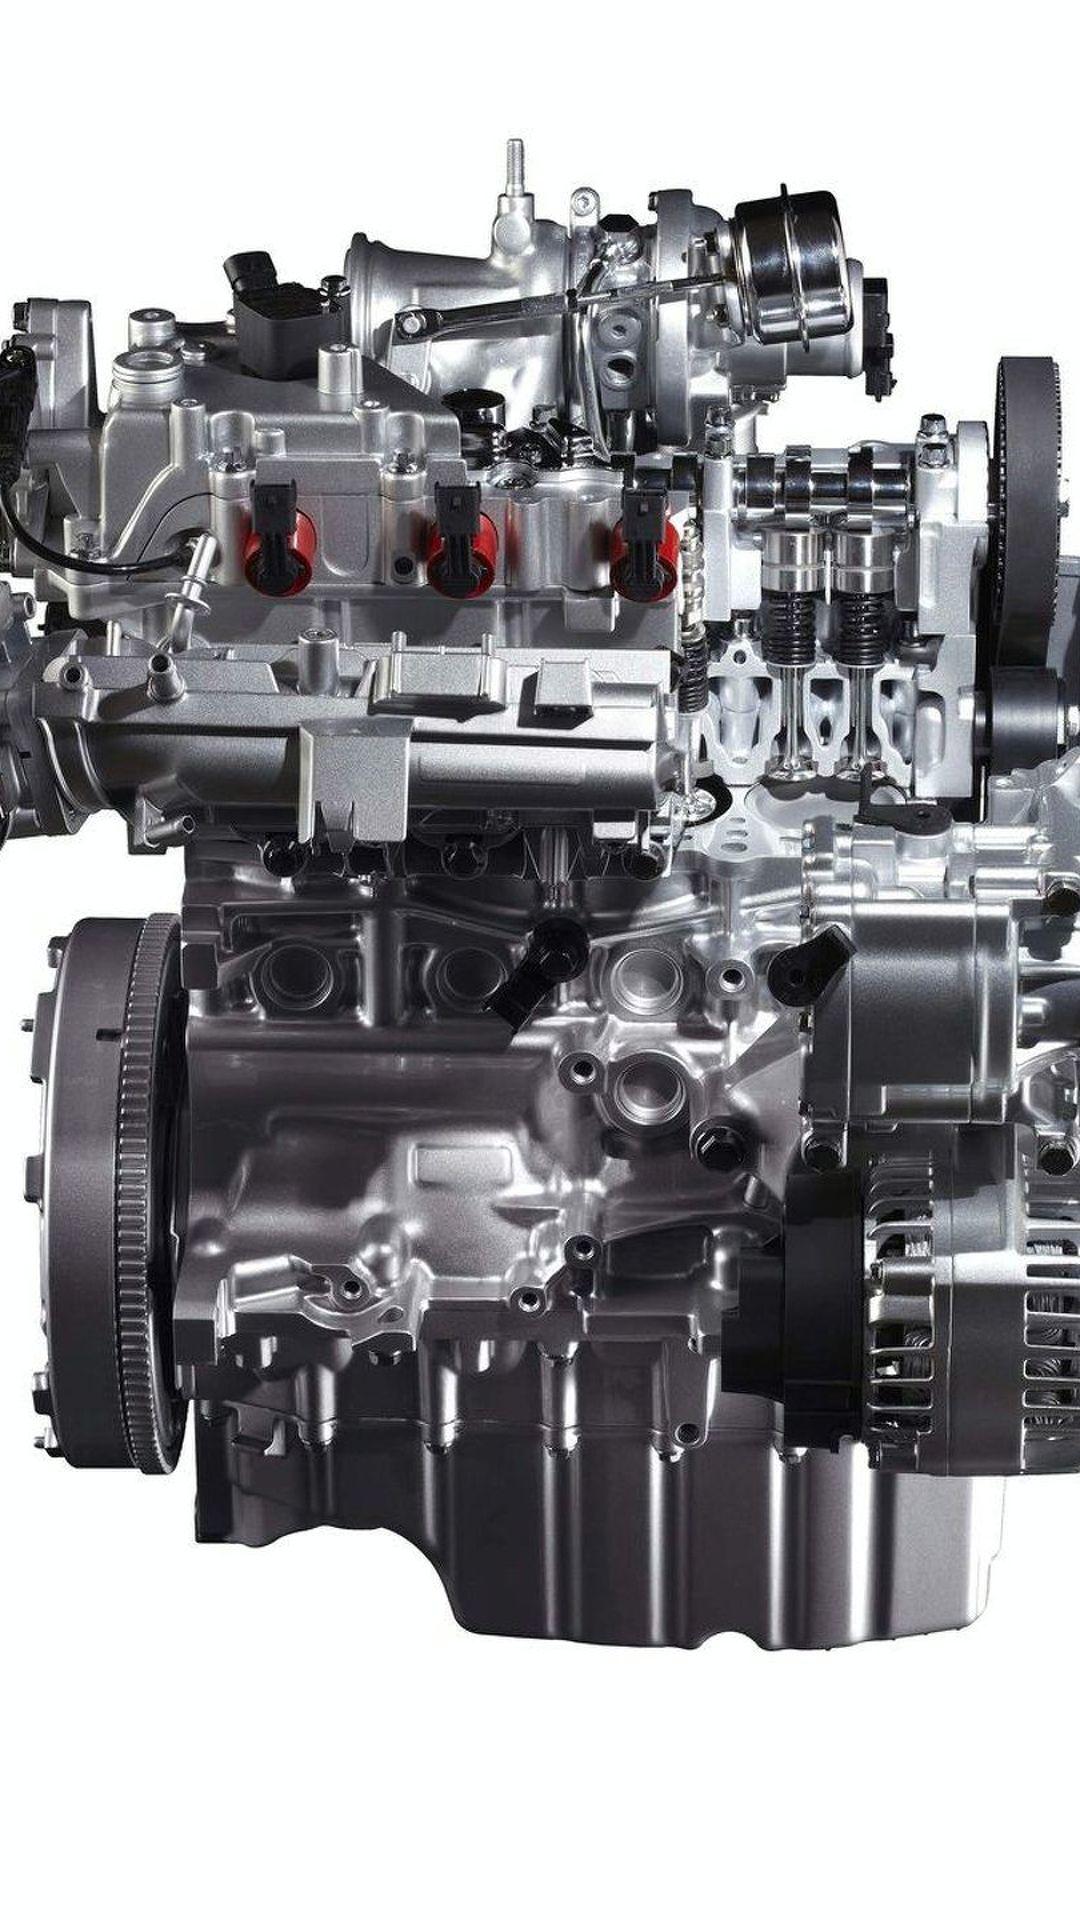 Chrysler to Build Fiat 1.4L Multiair Engine in Michigan